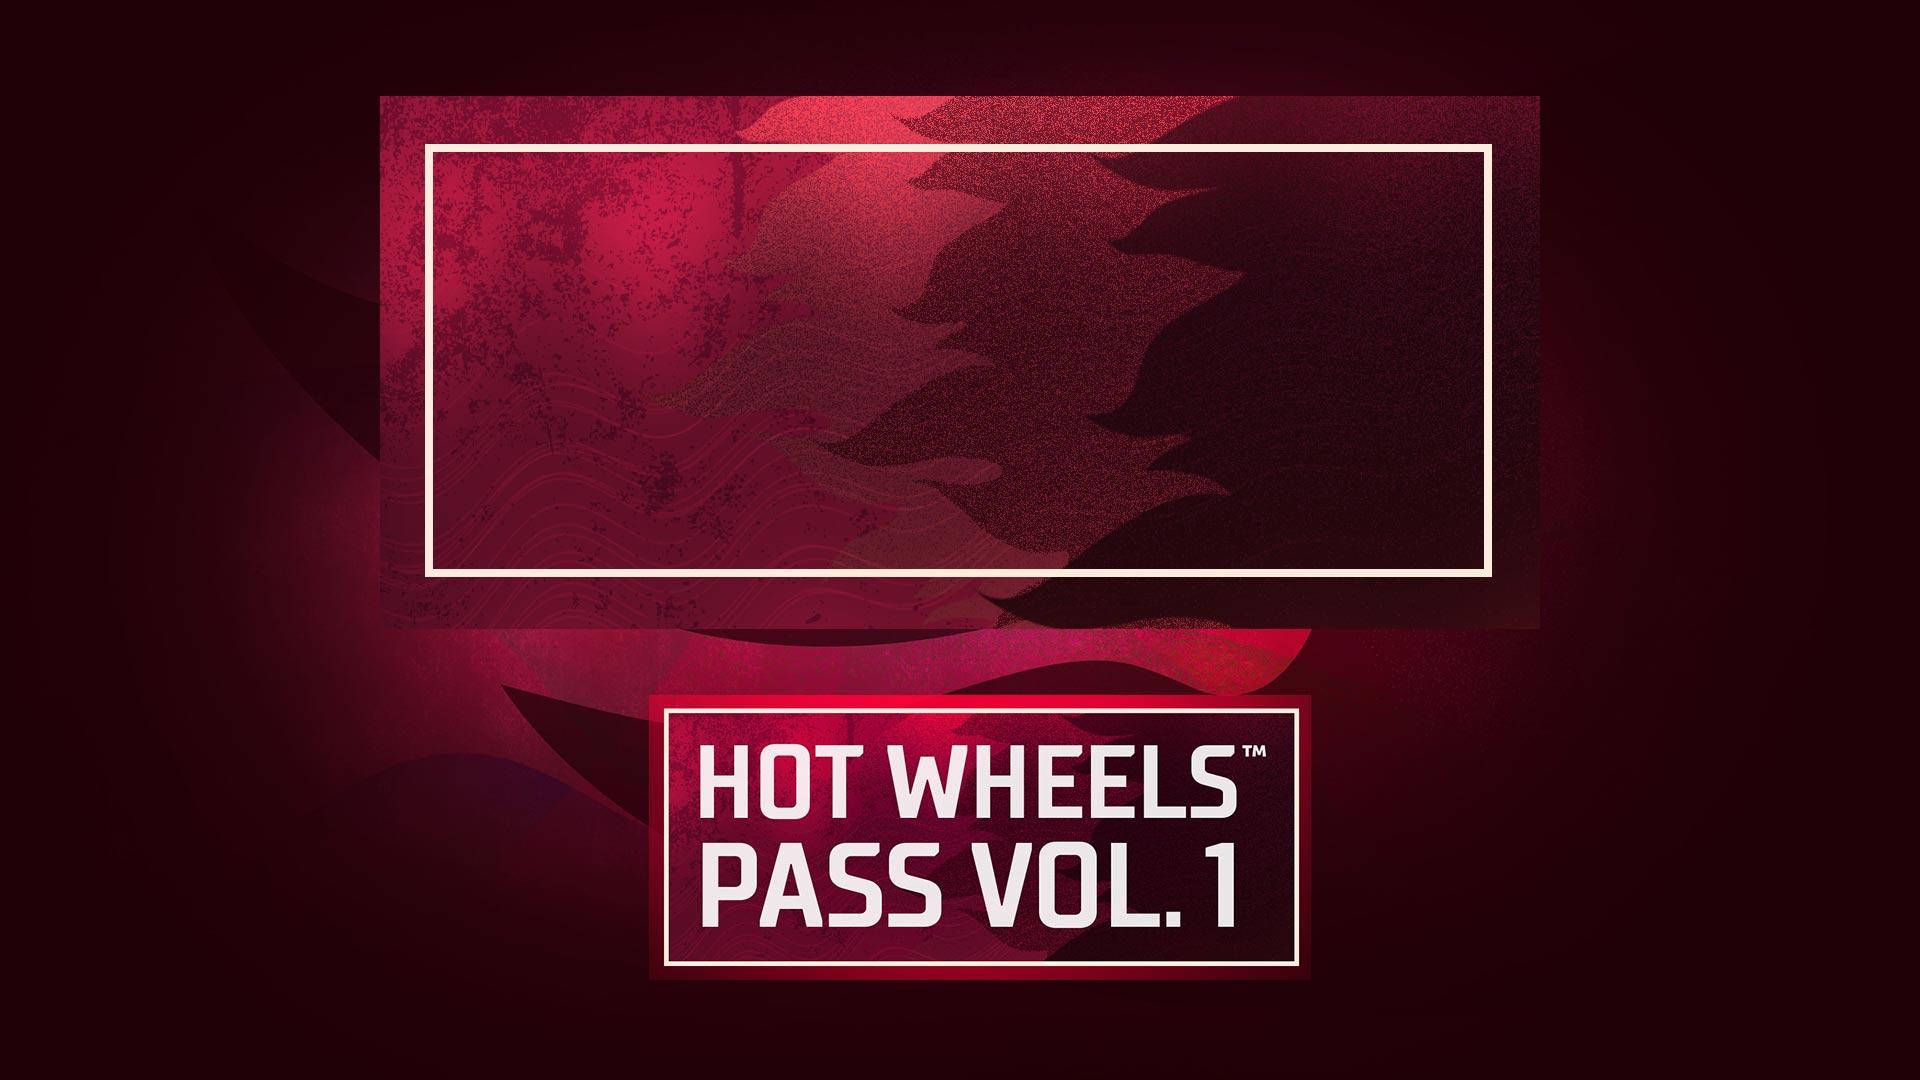 HOTWHEELS unleashed grafico milano season pass 01